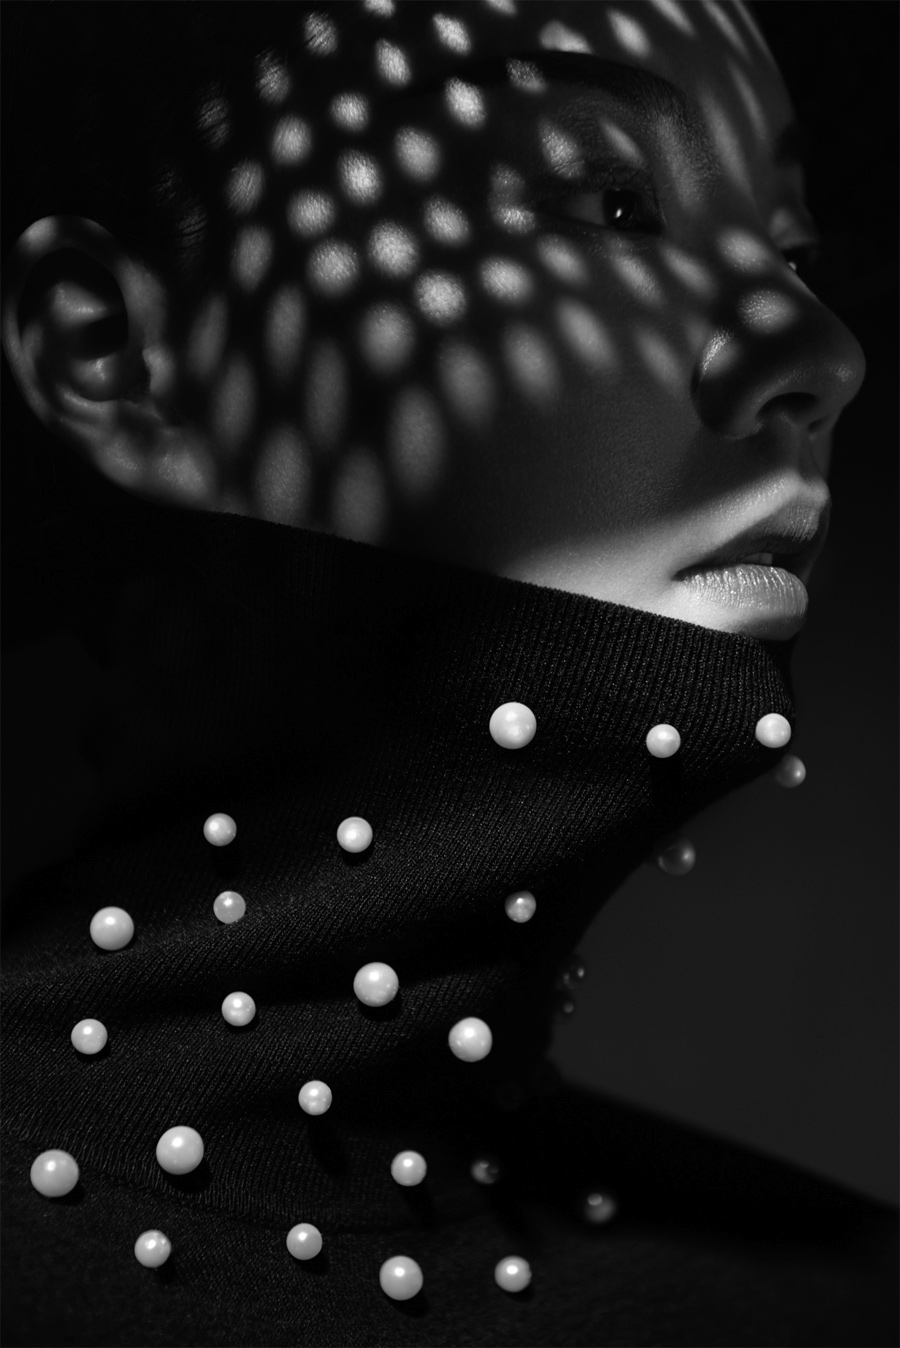 Тан Ксингруи / Tan Xingrui, Первое место в категории «Творчество — Мода/Красота», Фотоконкурс WPPI Annual Print Competition